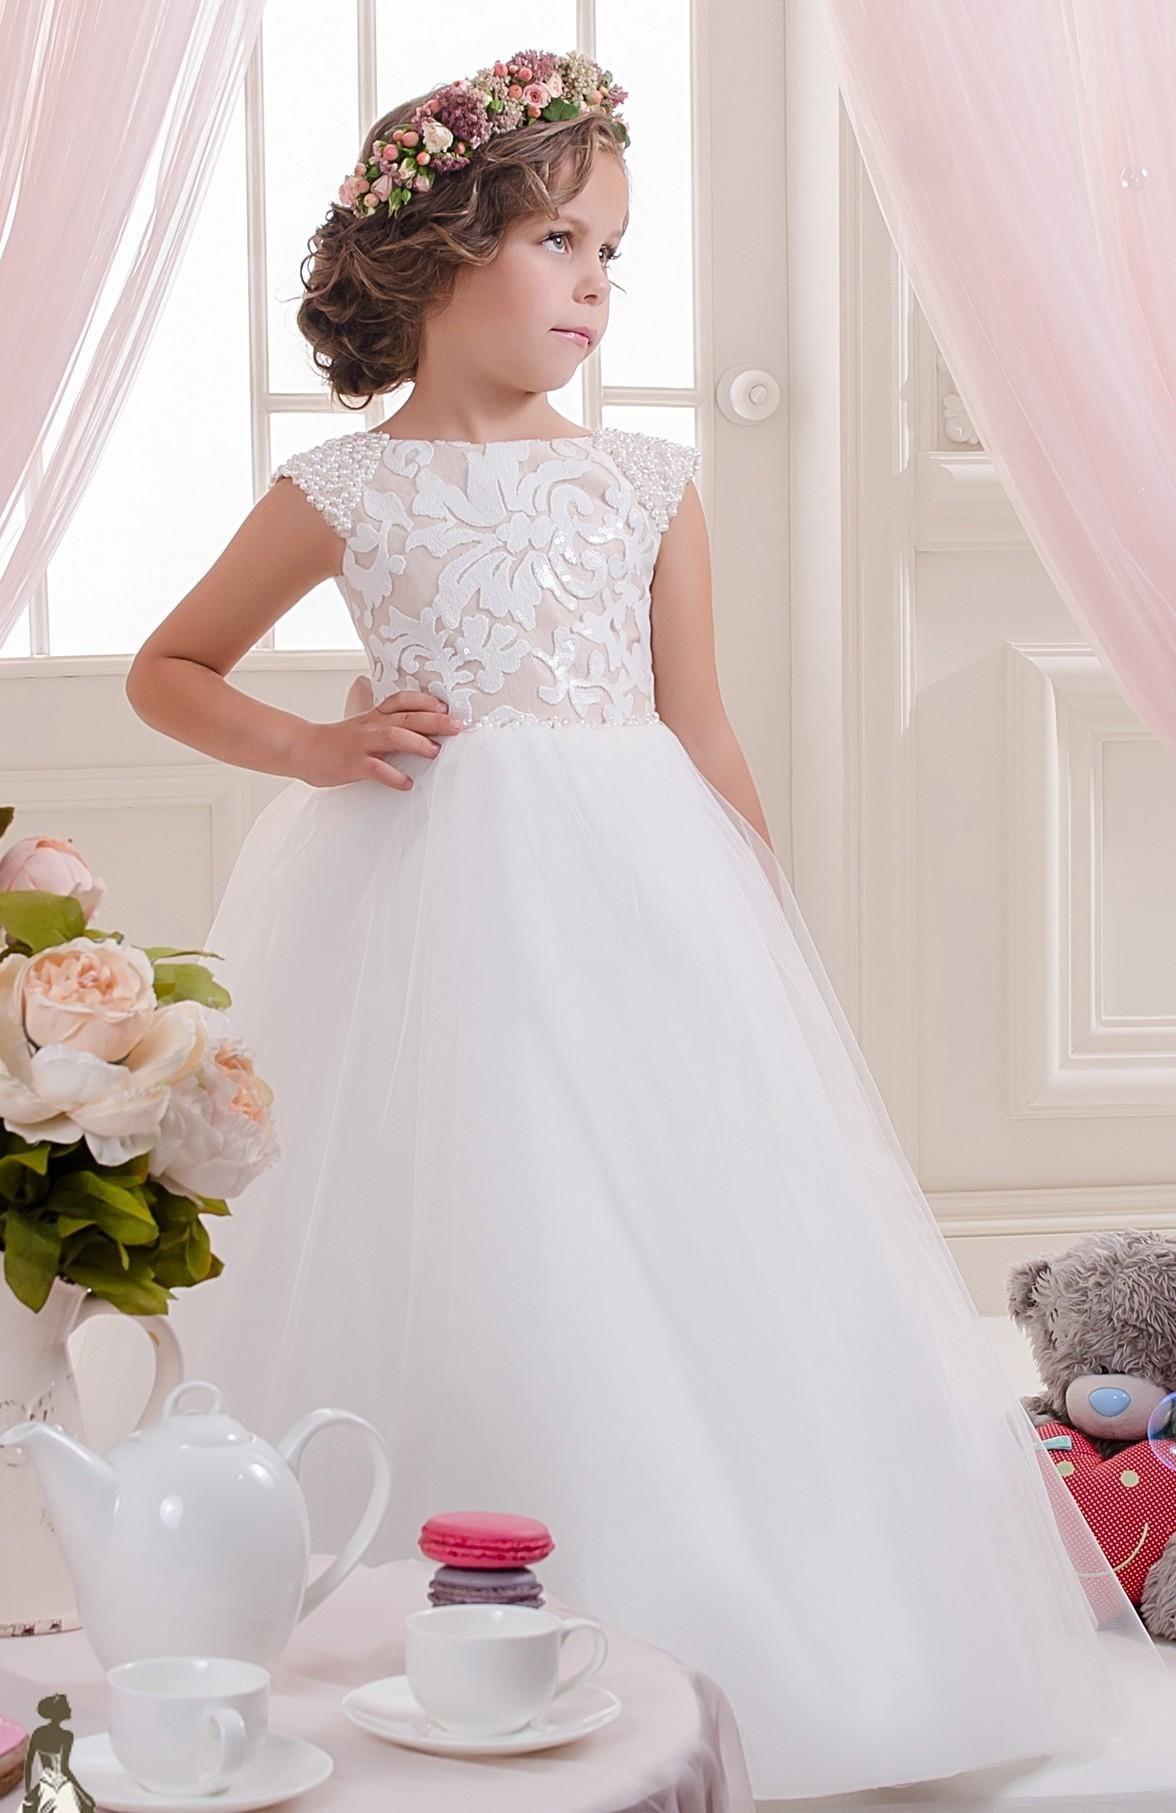 Girls wedding dress  Cheap Lace Pearls Off Shoulder Tulle Flower Girl Dresses Vintage